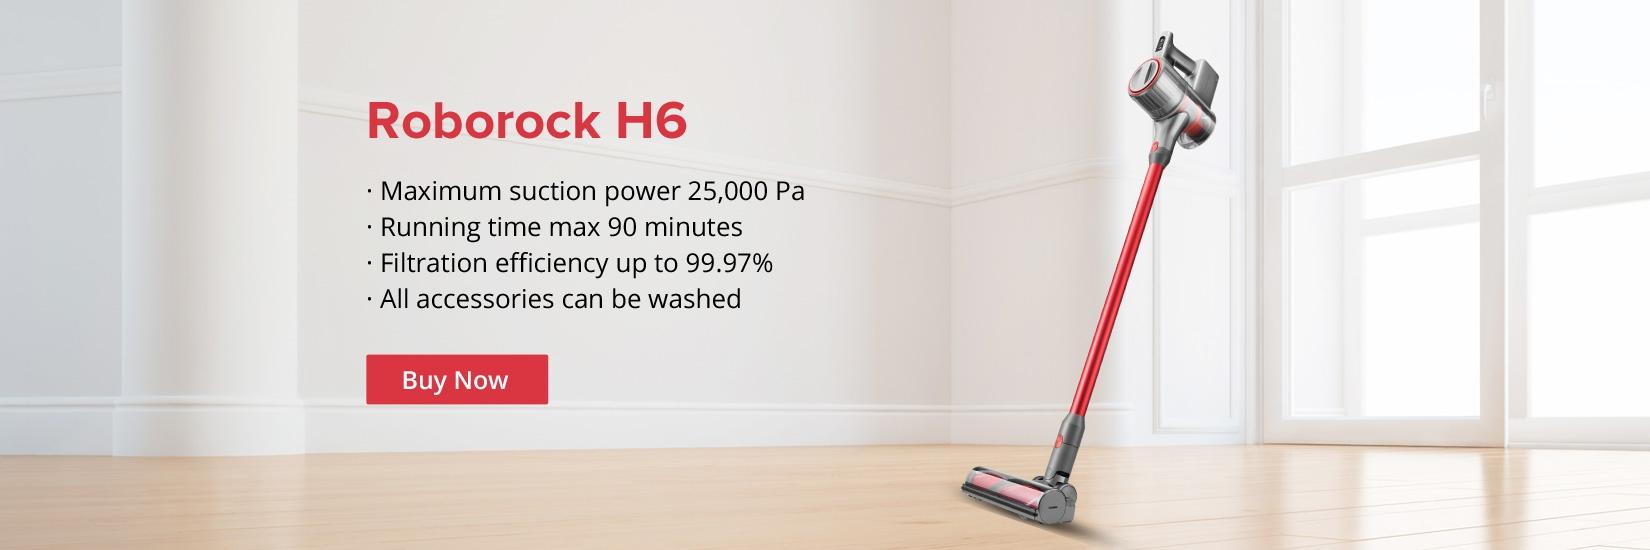 Roborock H6 Portable Wireless Handheld Vacuum Cleaner